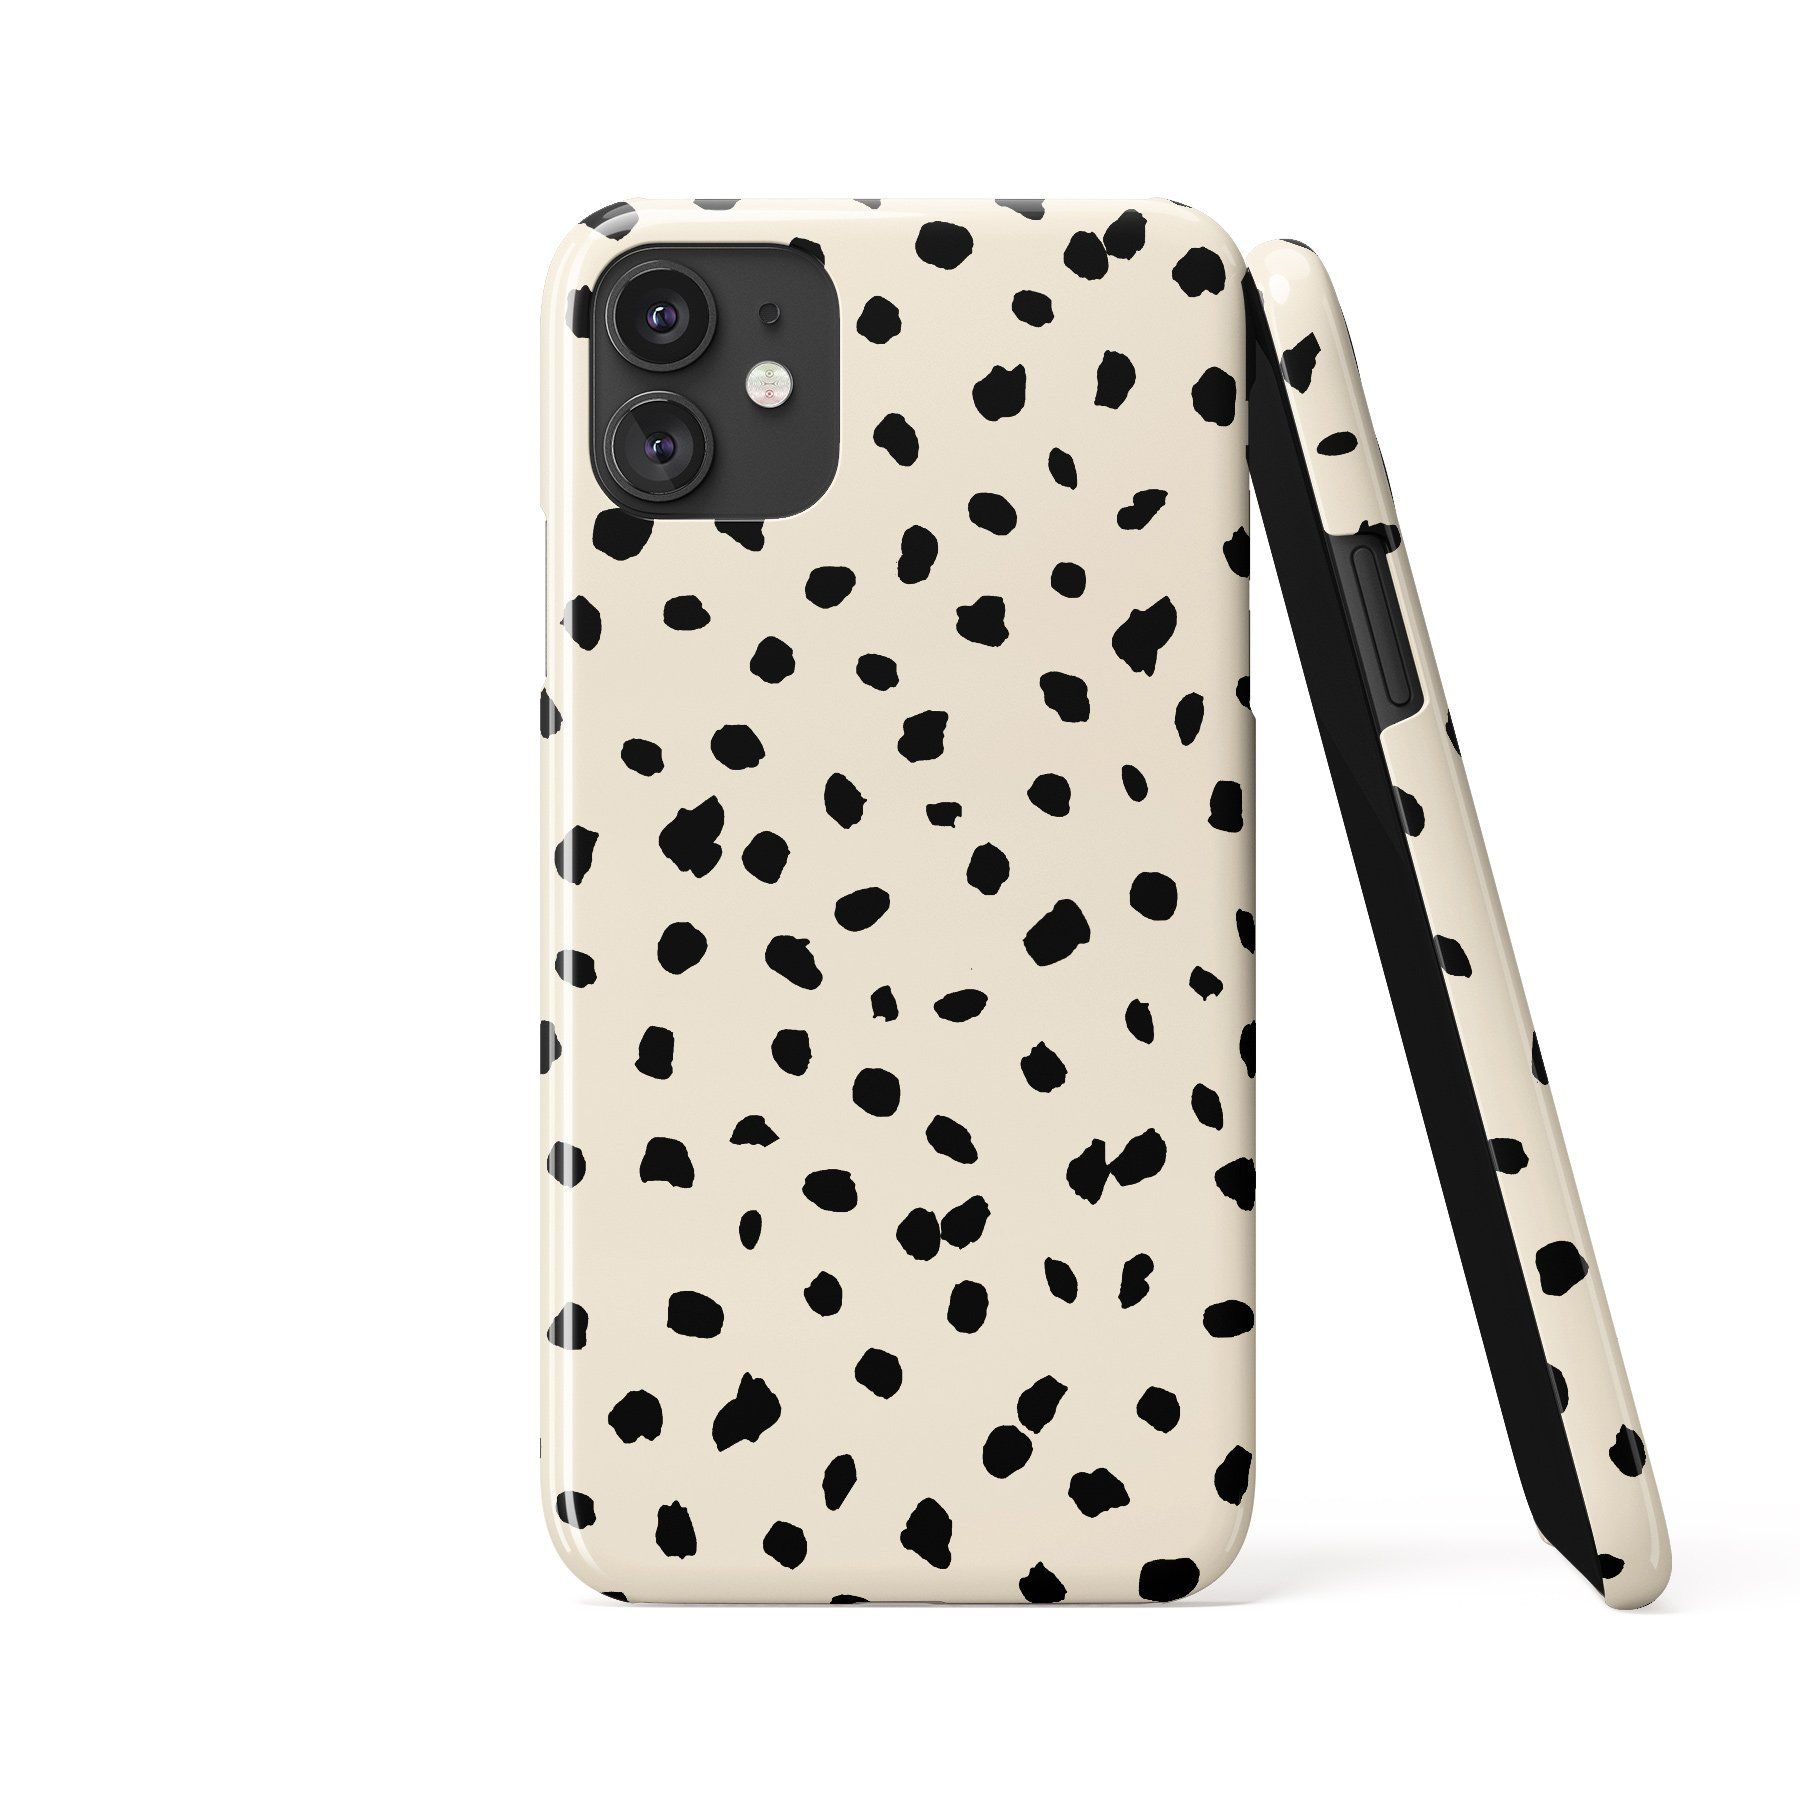 DOTTIE ANIMAL PRINT Cream Phone Case - iPhone SE 2020 / 8 / 7 / Snap Case - Gloss